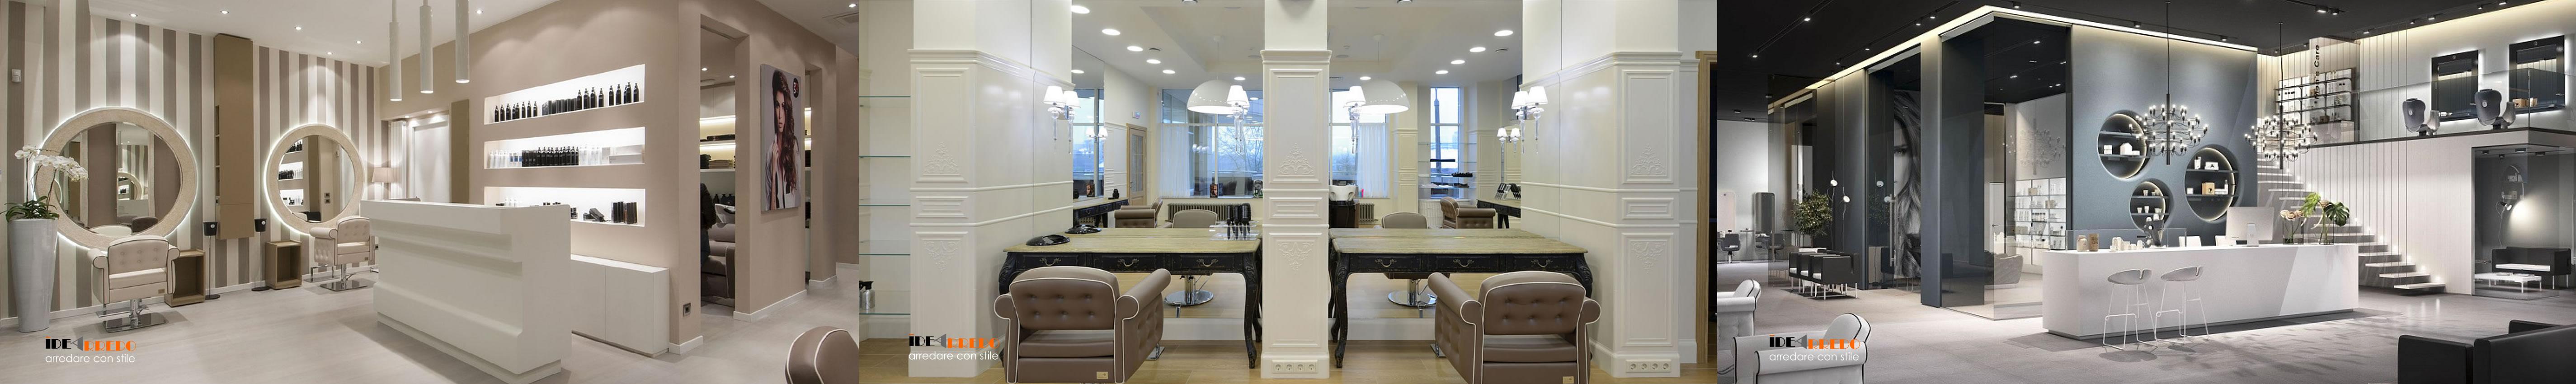 Idea arredo arredamento parrucchieri e centri estetitici for Arredamento parrucchieri